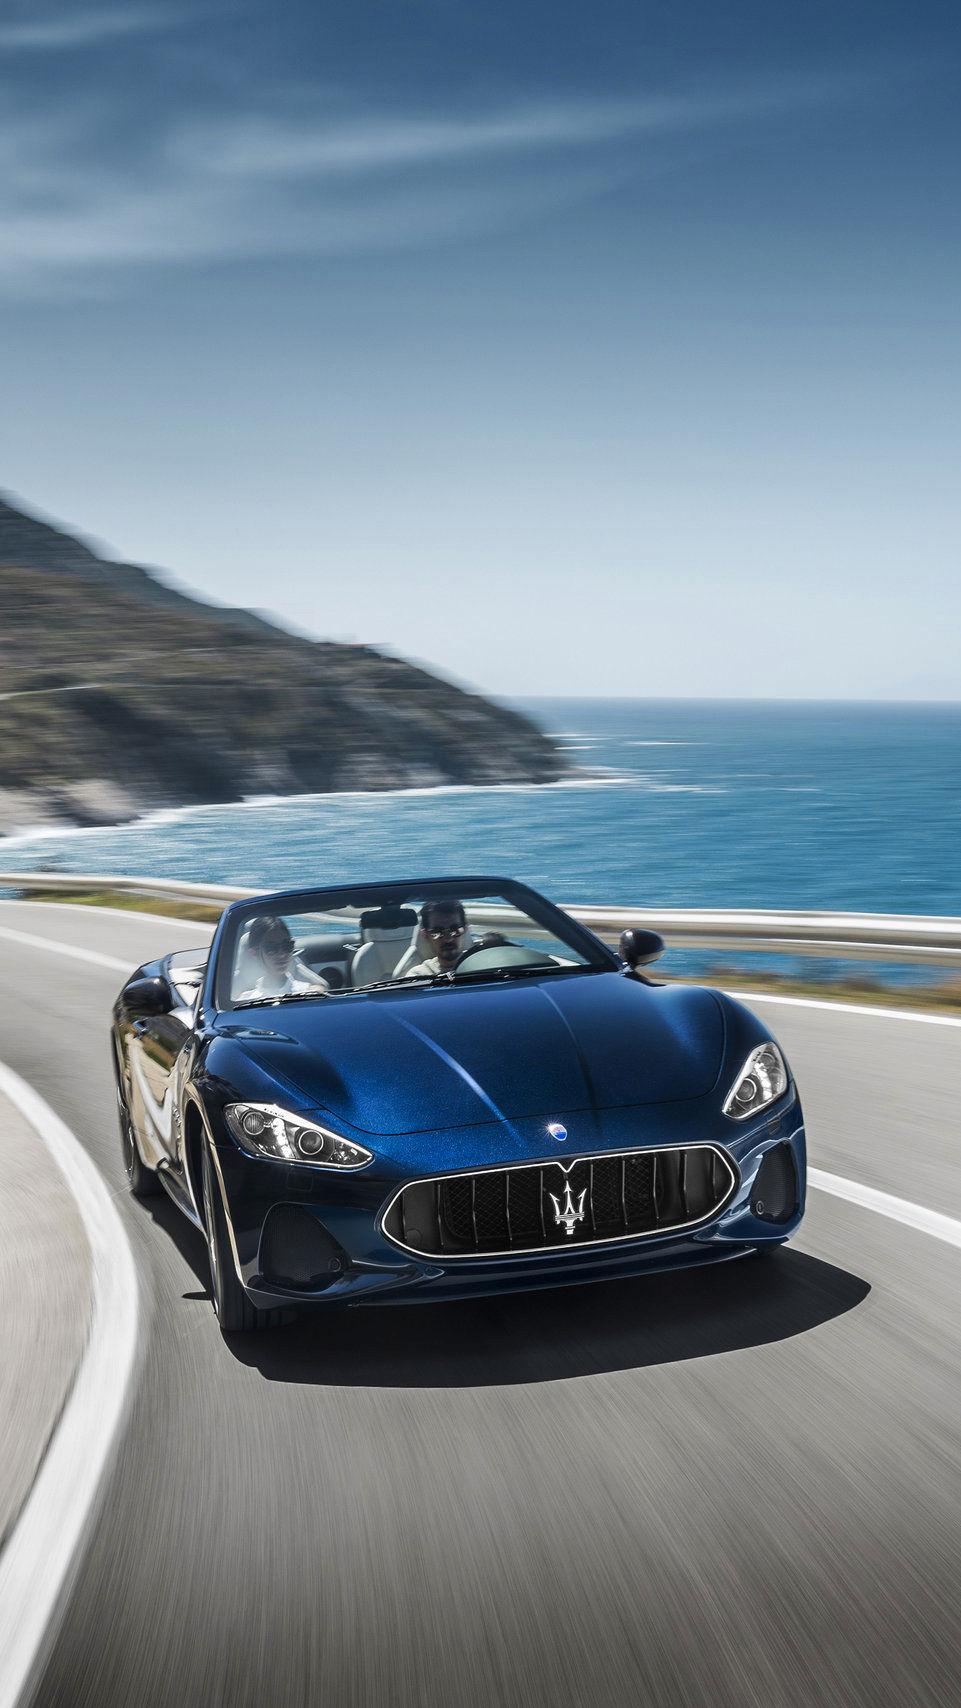 Maserati GranCabrio - in der Kurve - Landschaft am Meer